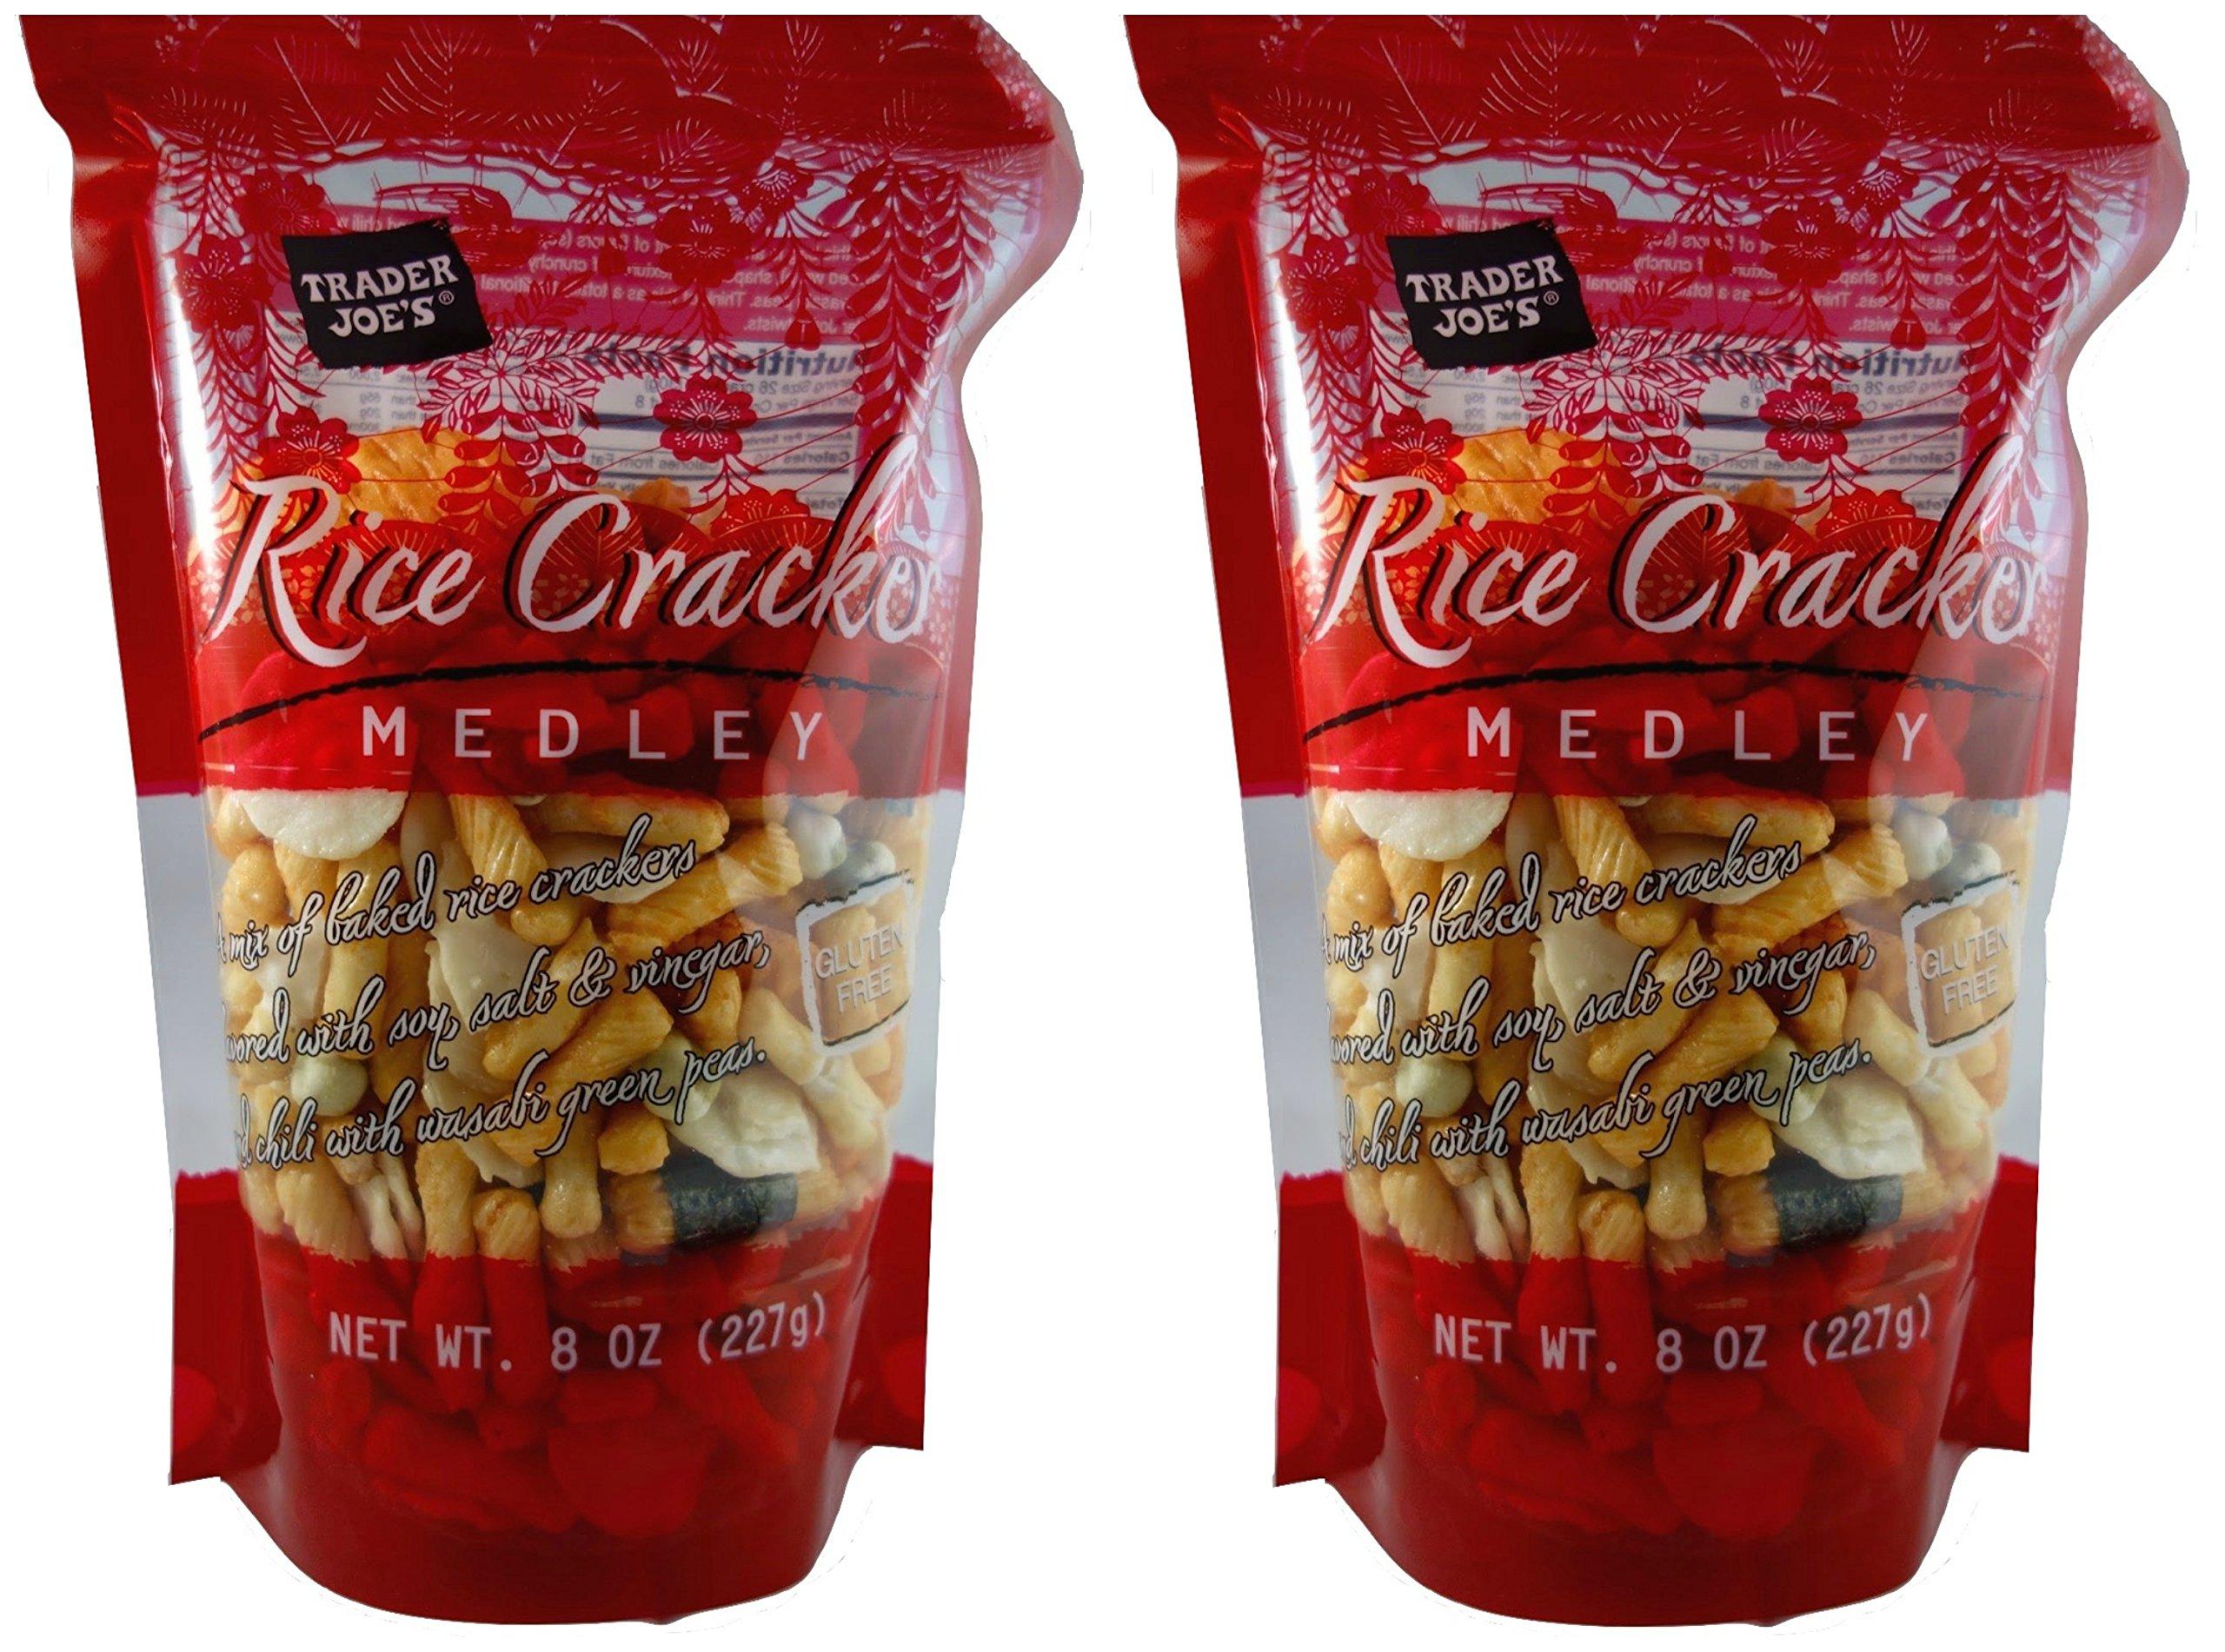 Trader Joe's Gluten Free Rice Cracker Snack Mix Medley, 8 oz Bag (Pack of 2)